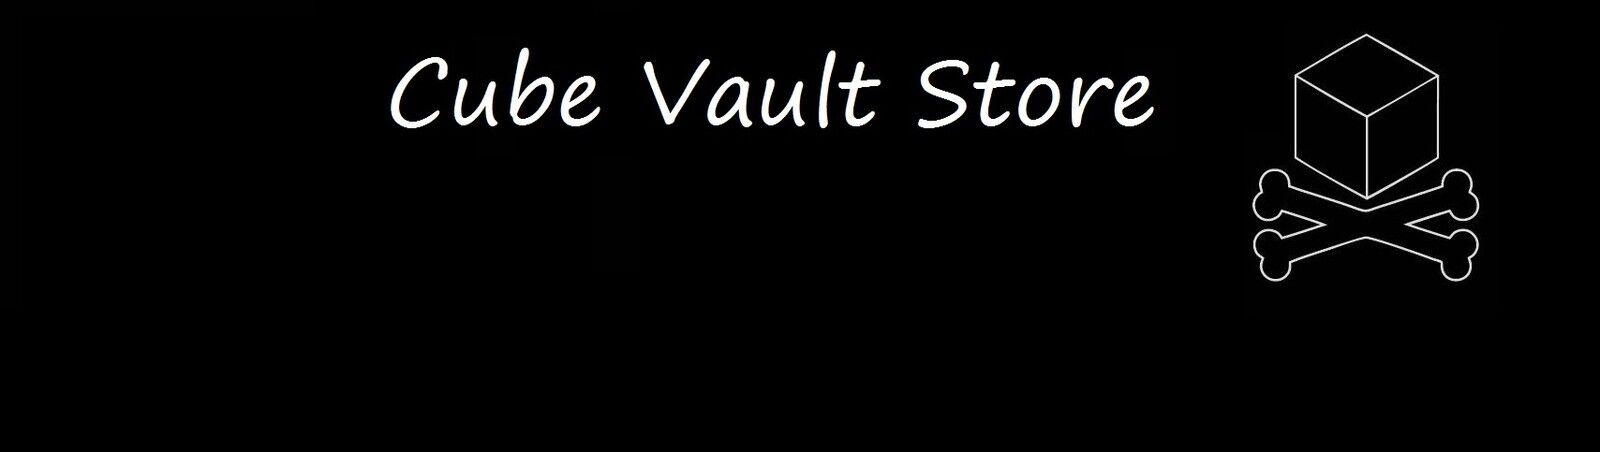 Cube Vault Store